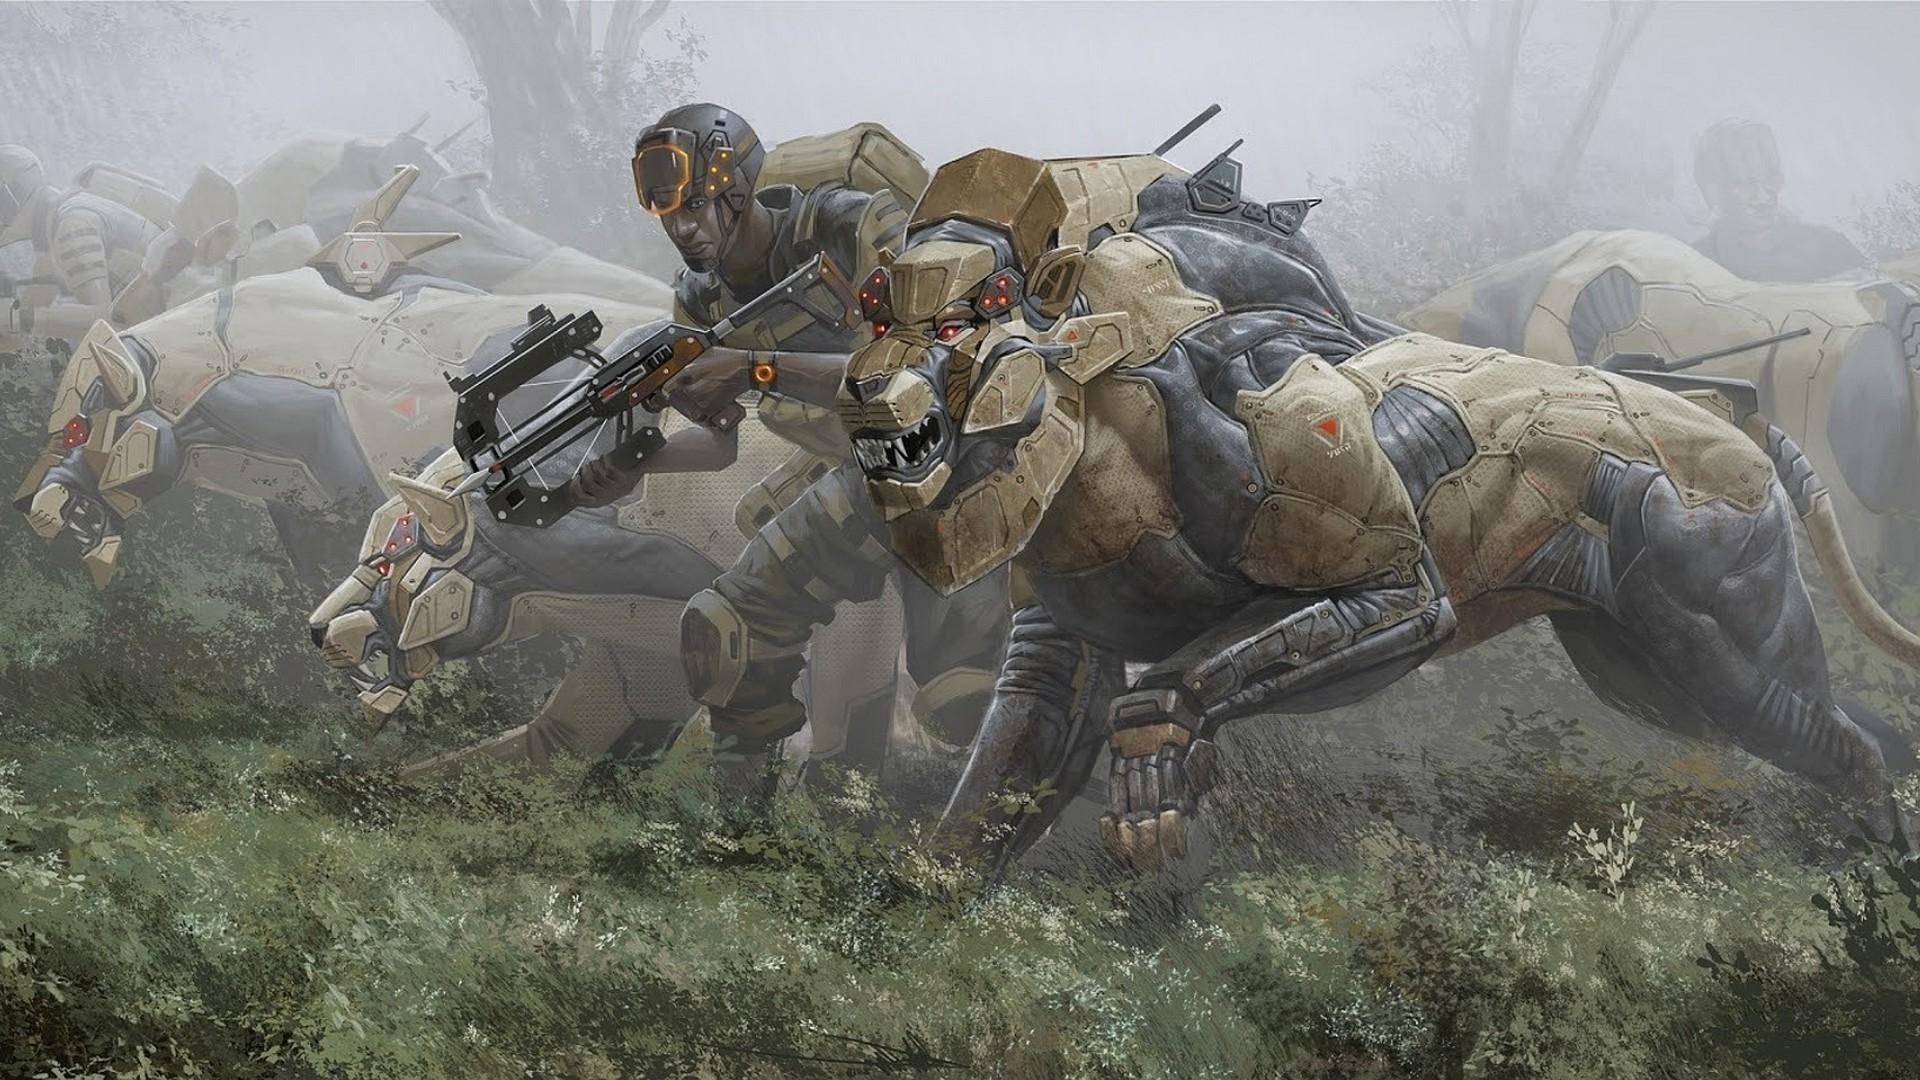 Deviantart Robot Animals: Wallpaper : Animals, Robot, Soldier, Science Fiction